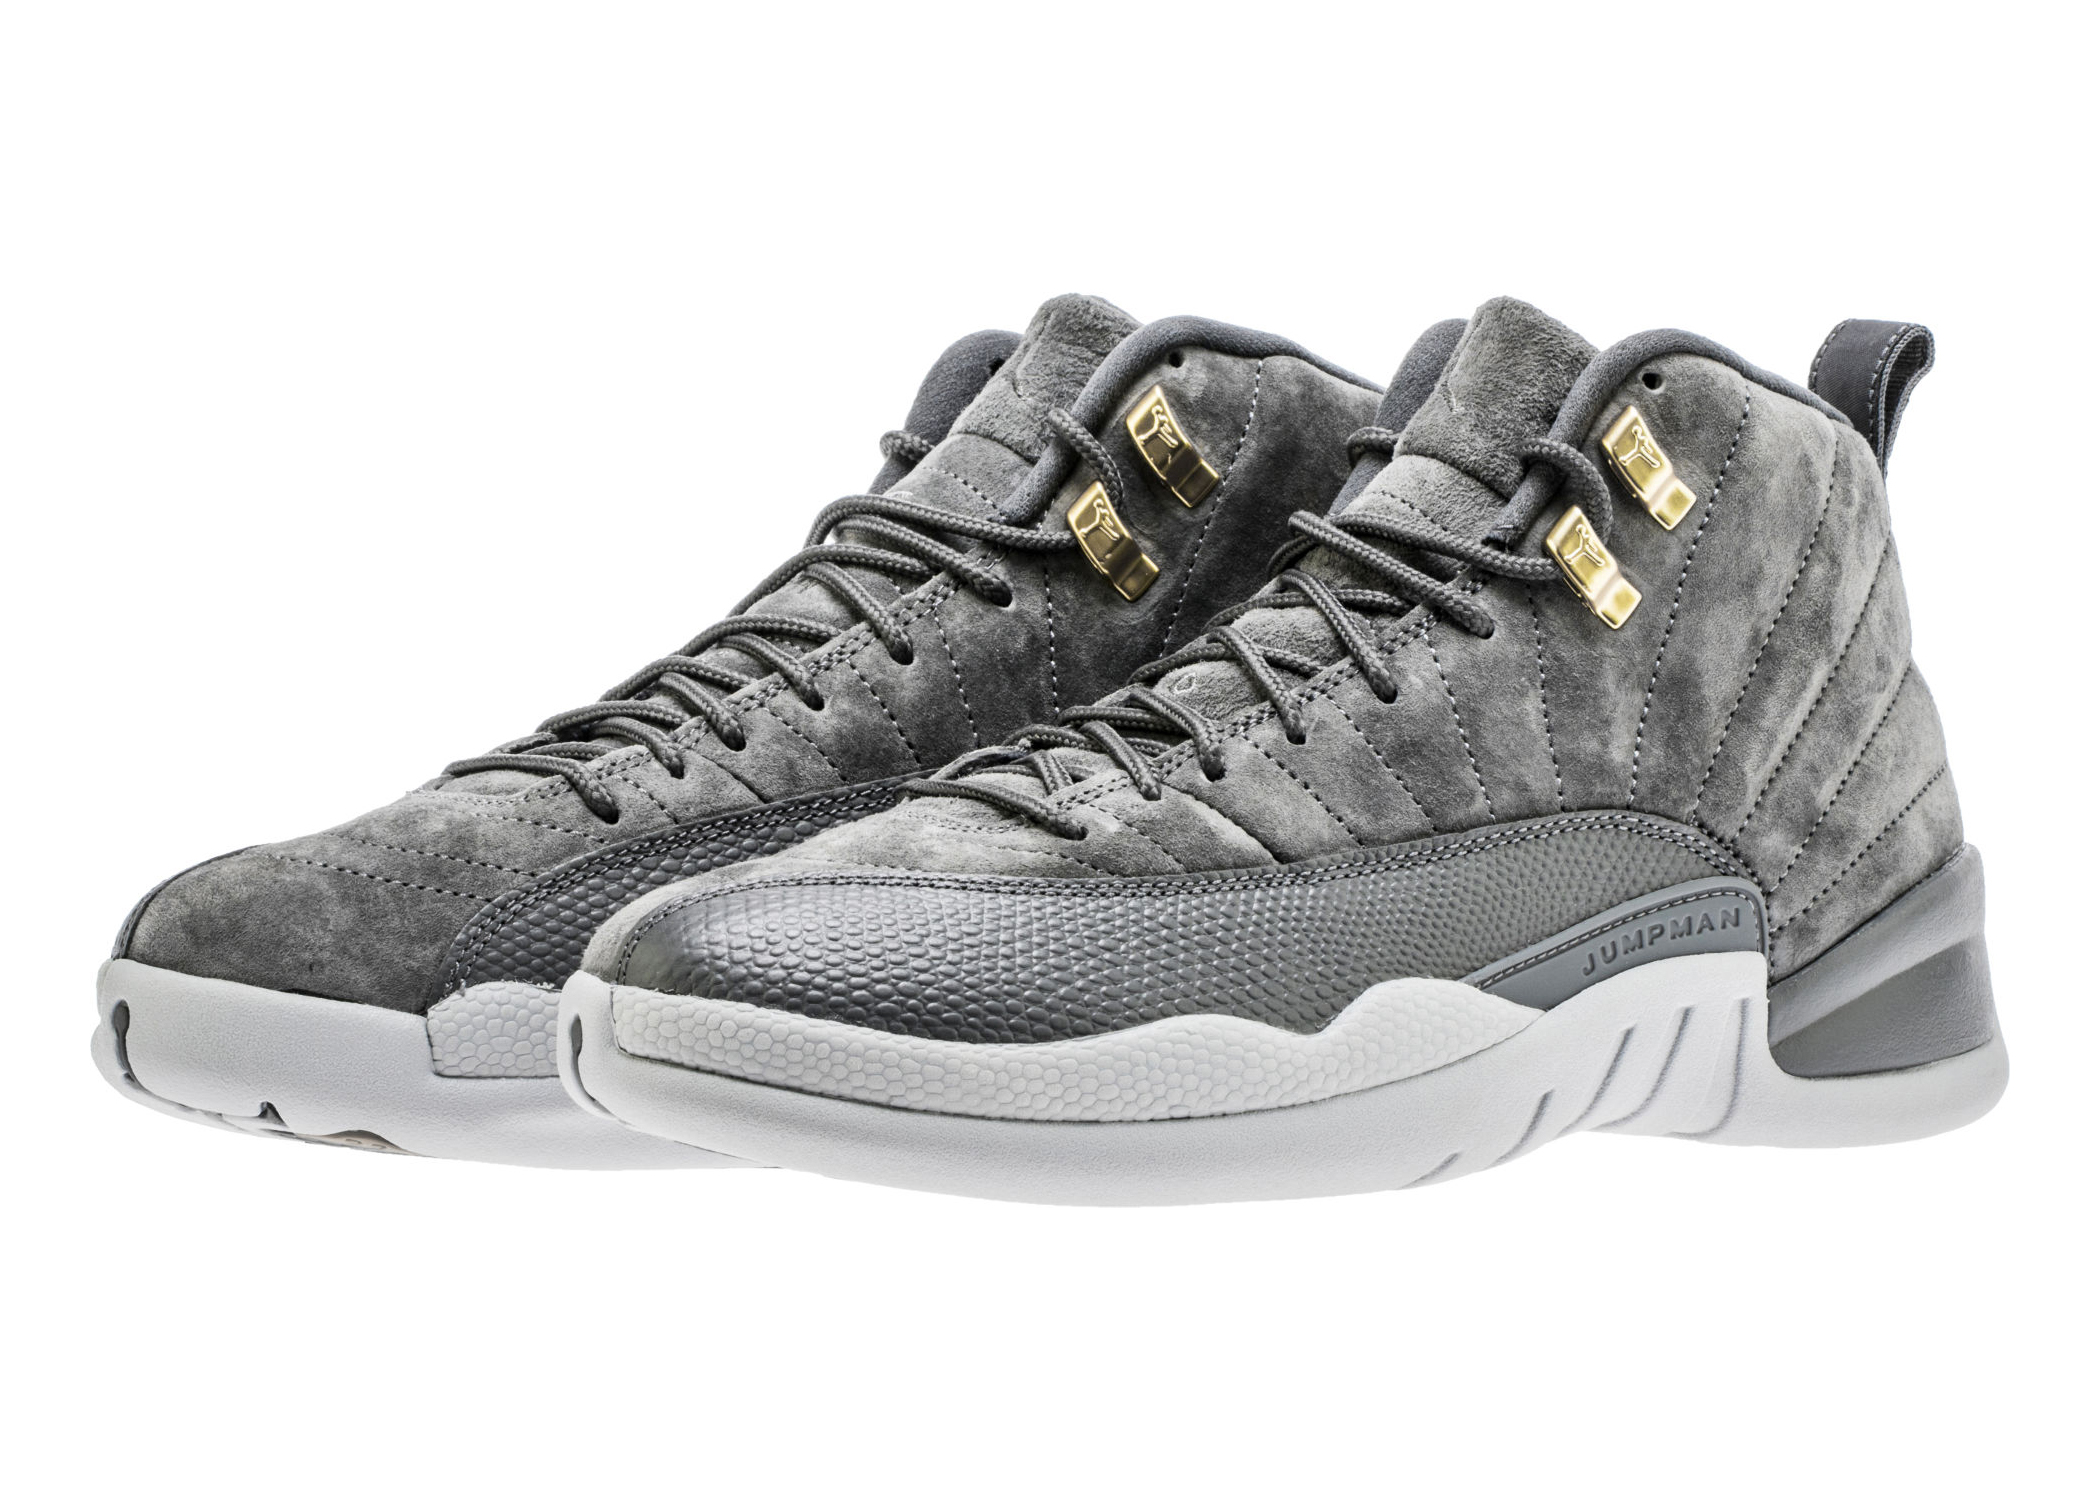 timeless design 37371 46809 The Air Jordan 12 Retro 'Dark Grey' Has a Release Date ...